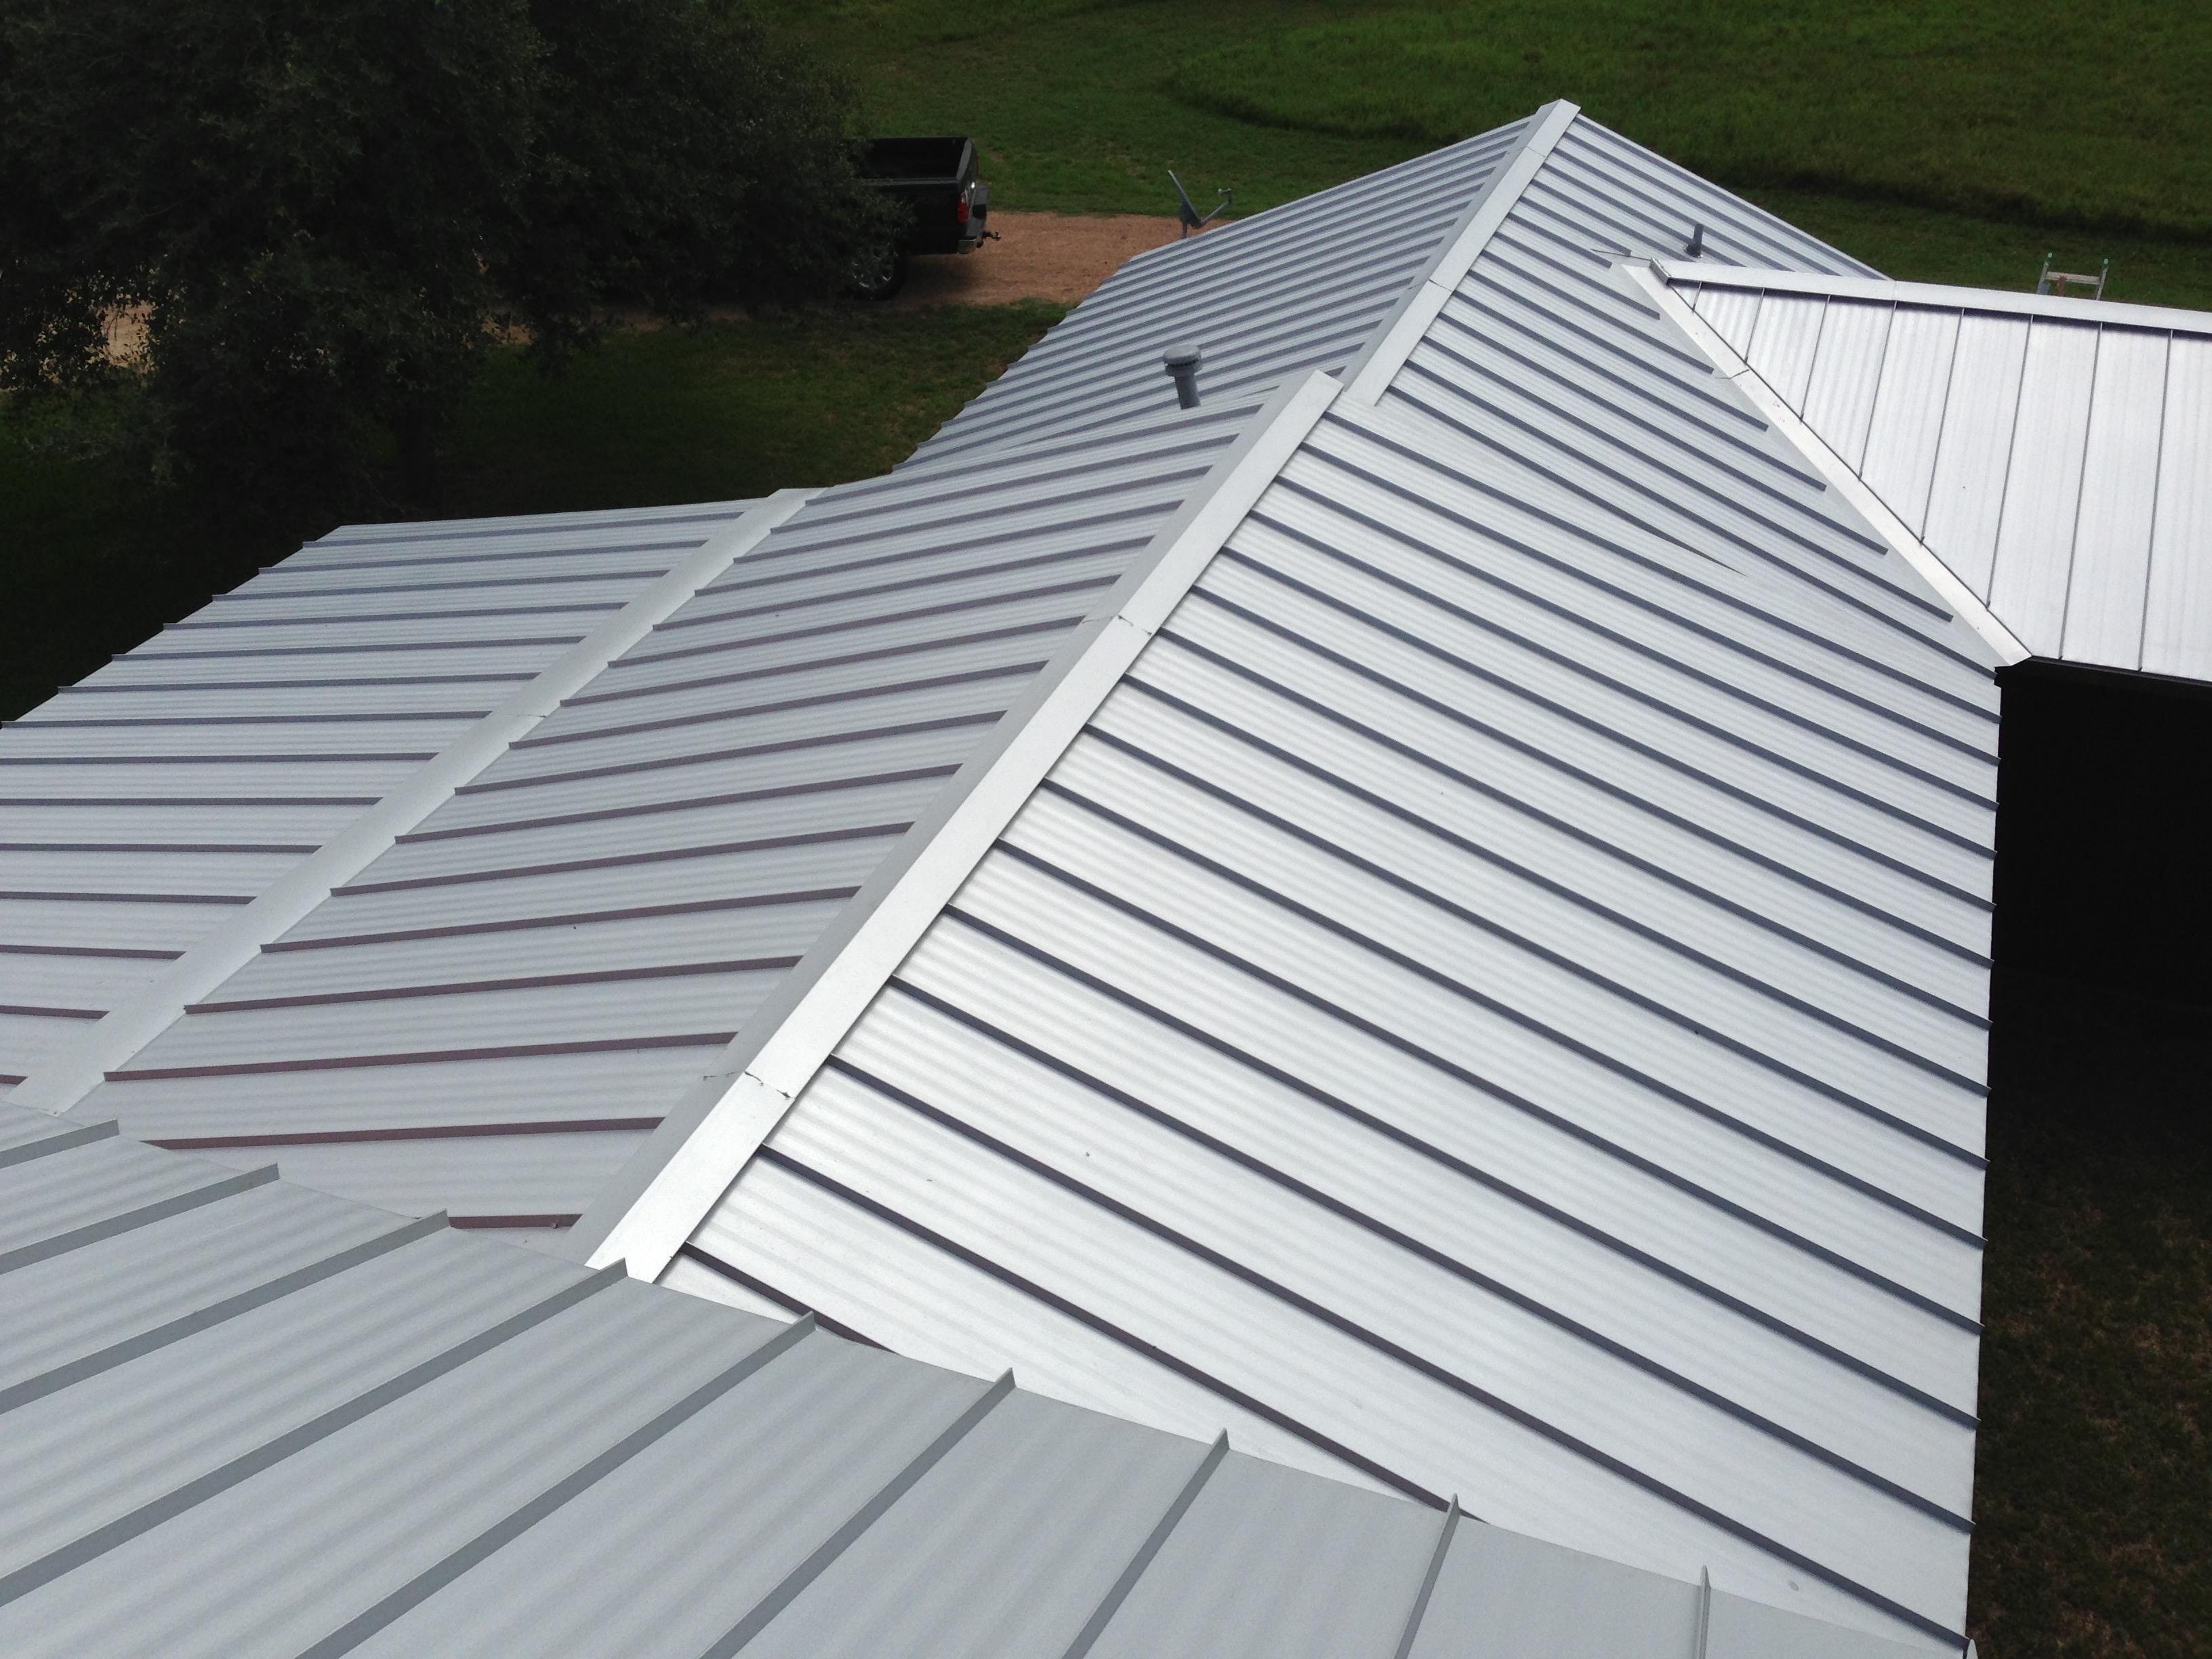 Texan Roofing image 4